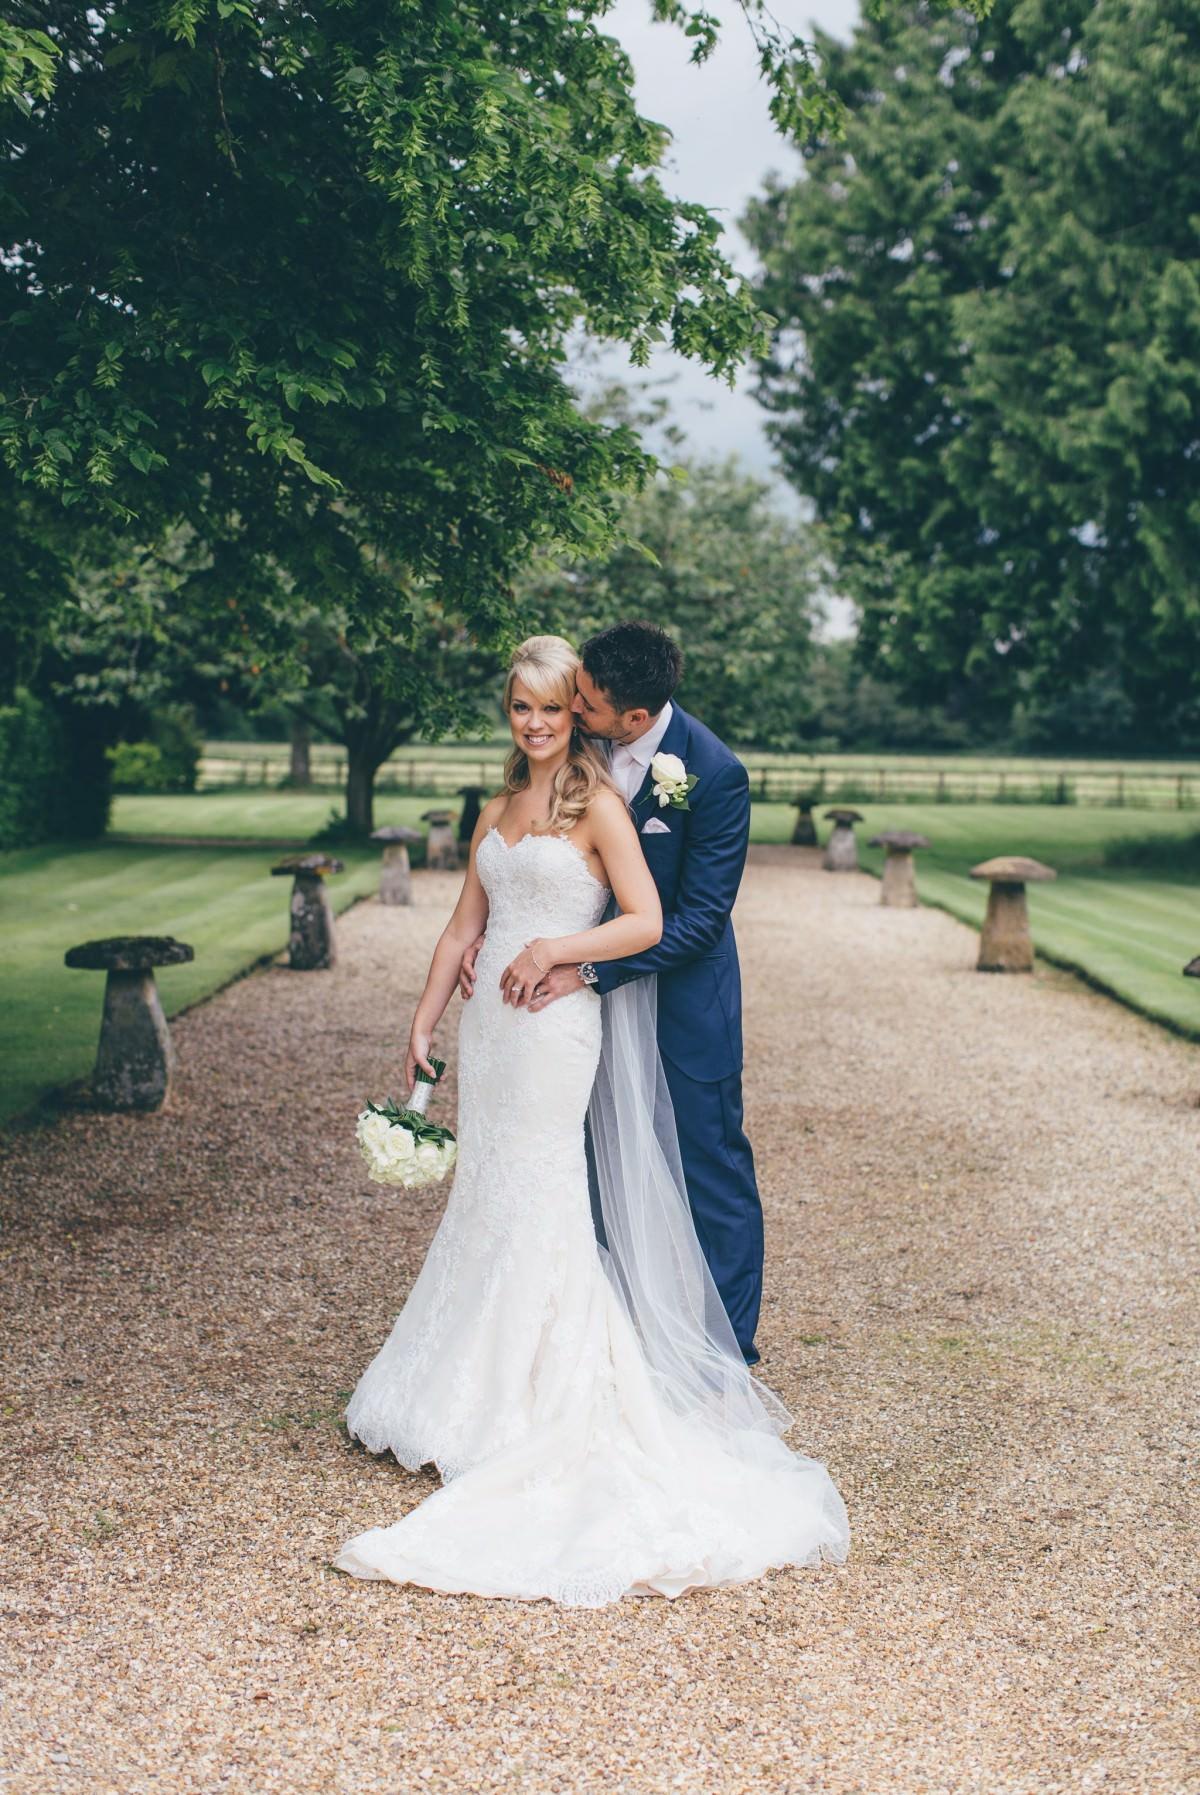 welsh_wedding_photographer_rachel_lambert_photography_lower_slaughter_manor_house_cotswolds_harriet_dean_ 32